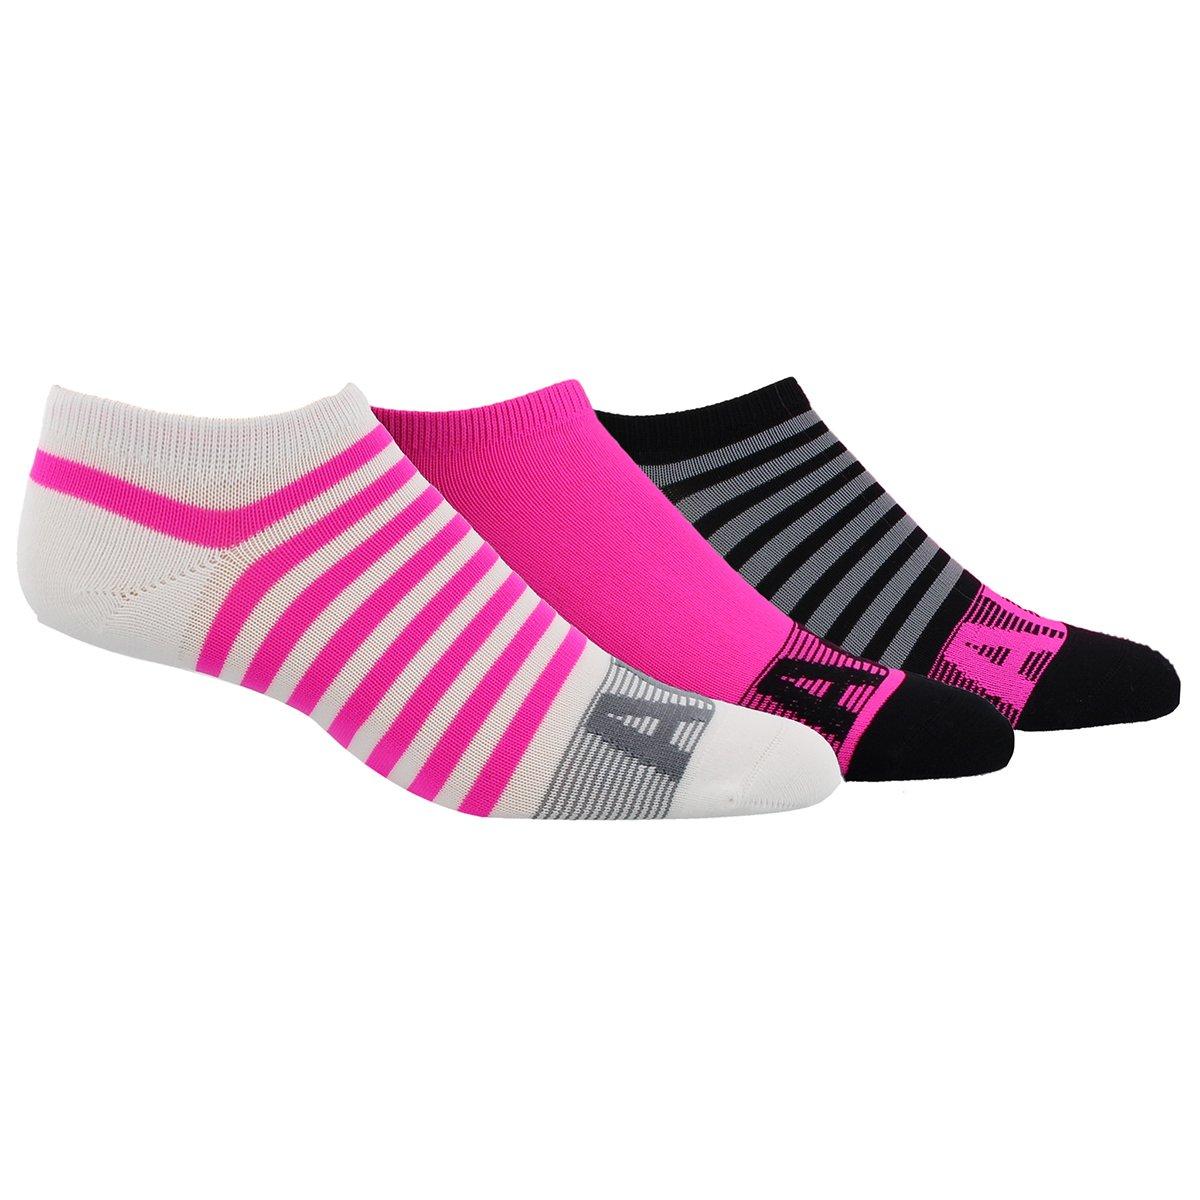 adidas Women's Adistripe No Show Socks (Pack of 3), White, M/M 200846